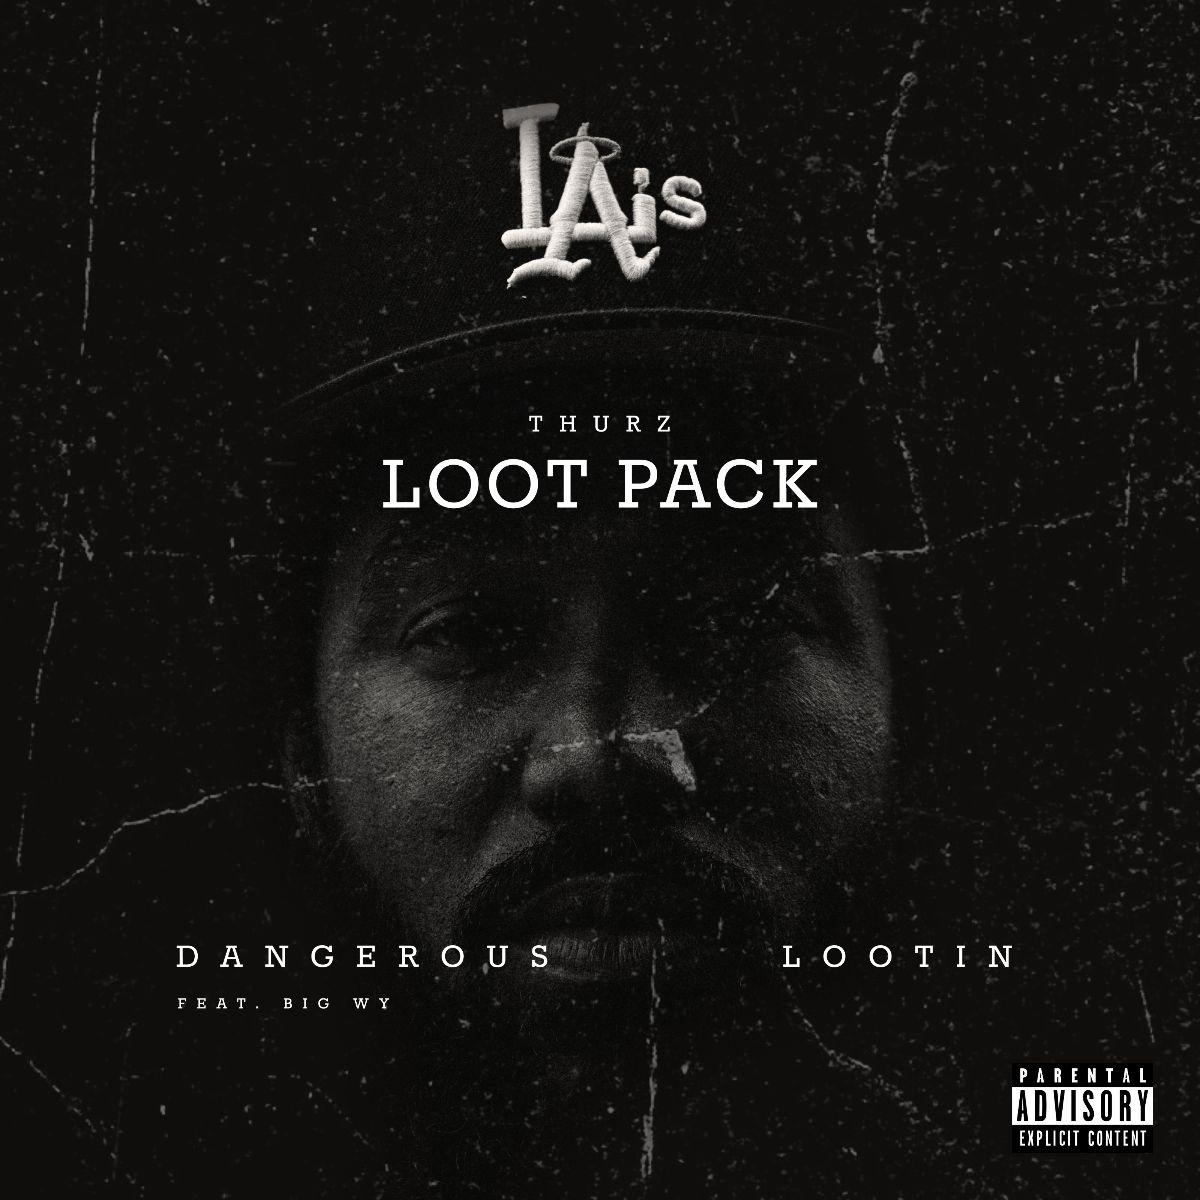 The LOOT Pack - https://t.co/p9x4VTsZrM https://t.co/wj32iRrMJu